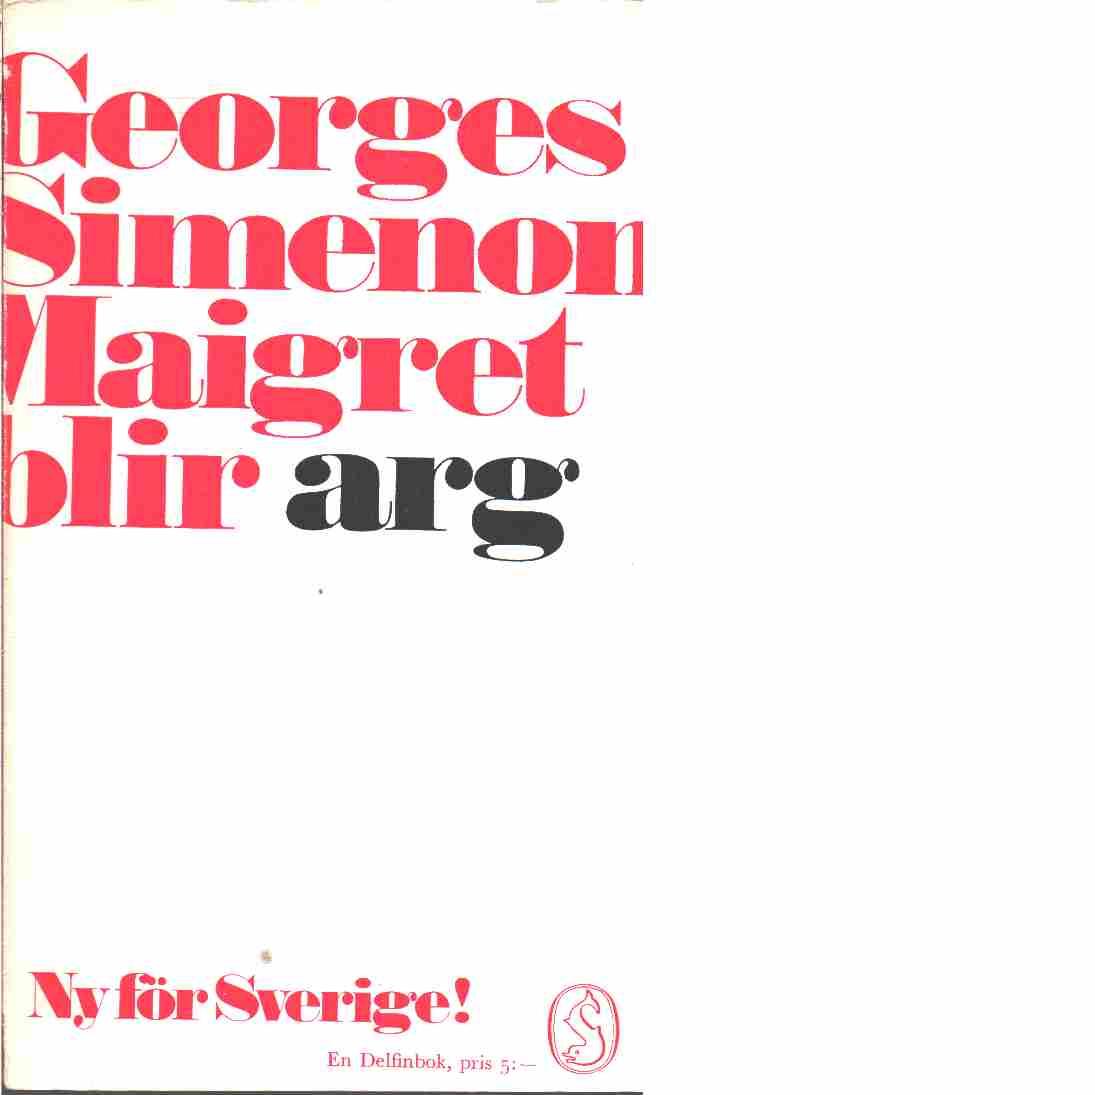 Maigret blir arg - Simenon, Georges